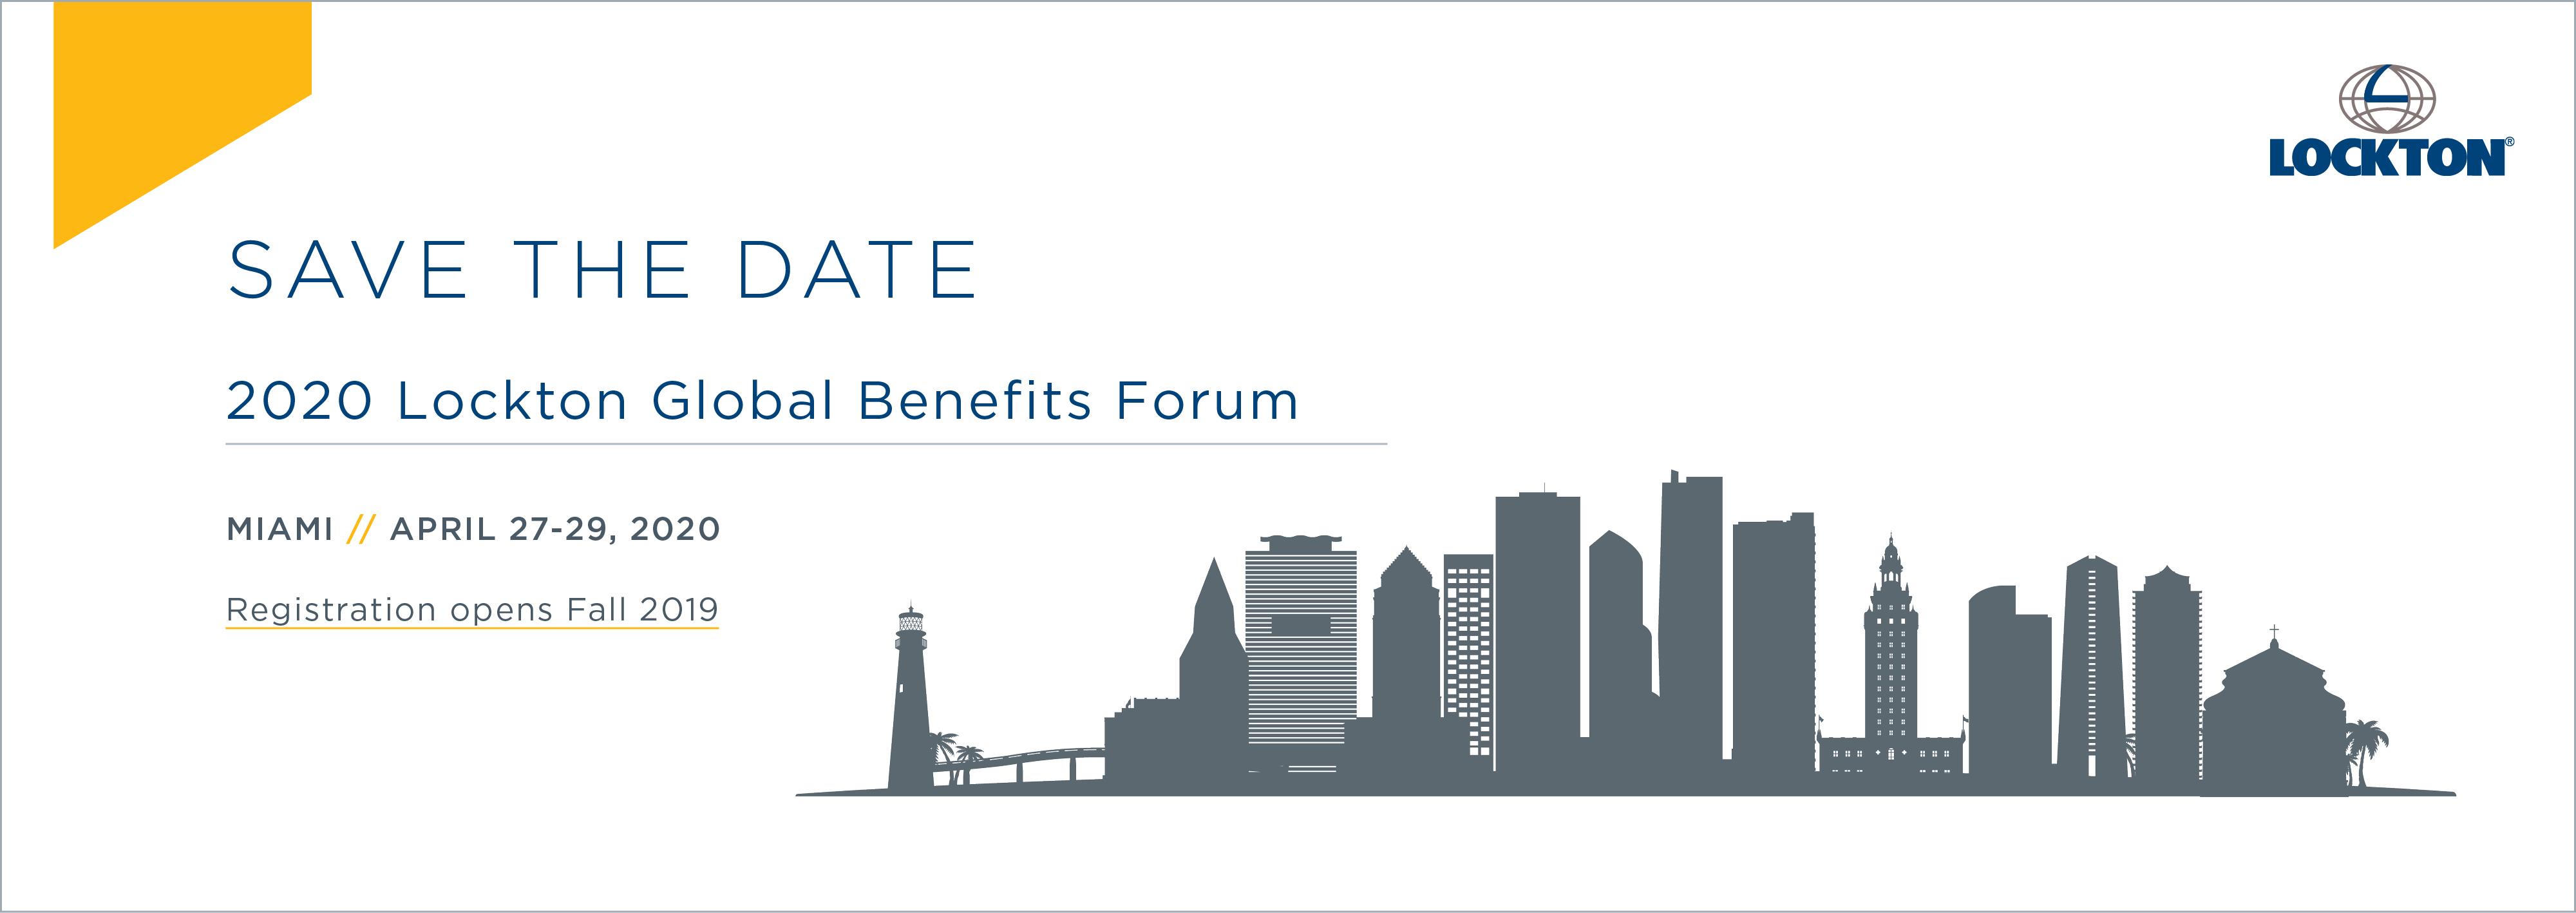 2019 Lockton Global Benefits Forum - Chicago